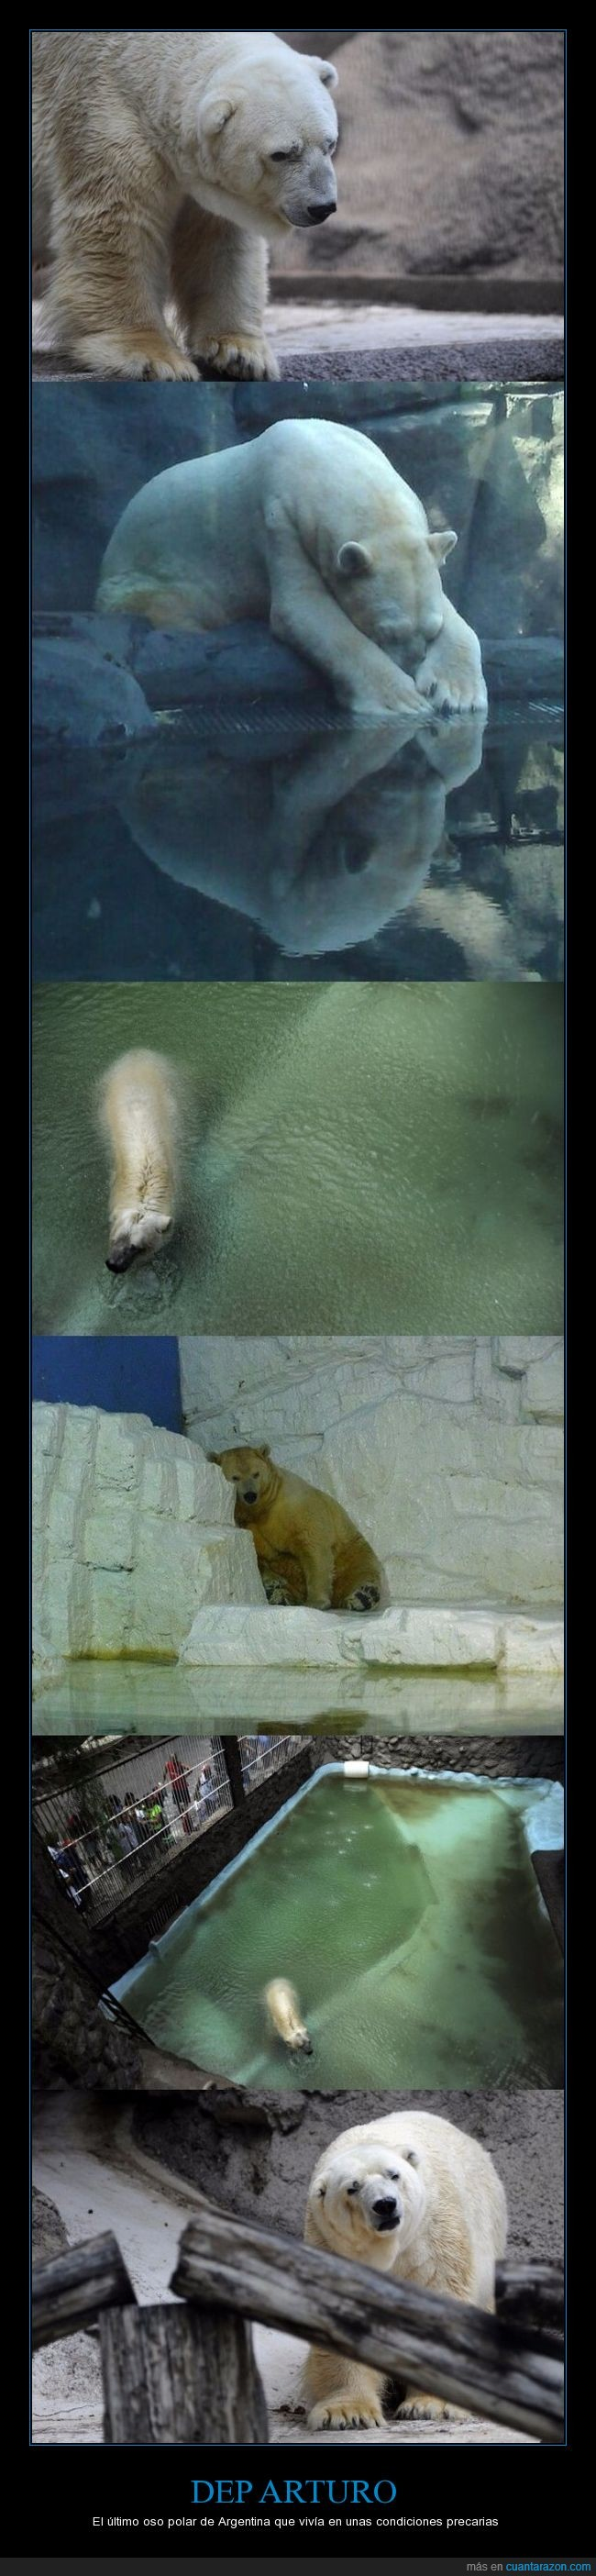 argentina,arturo,dep,oso polar,rip